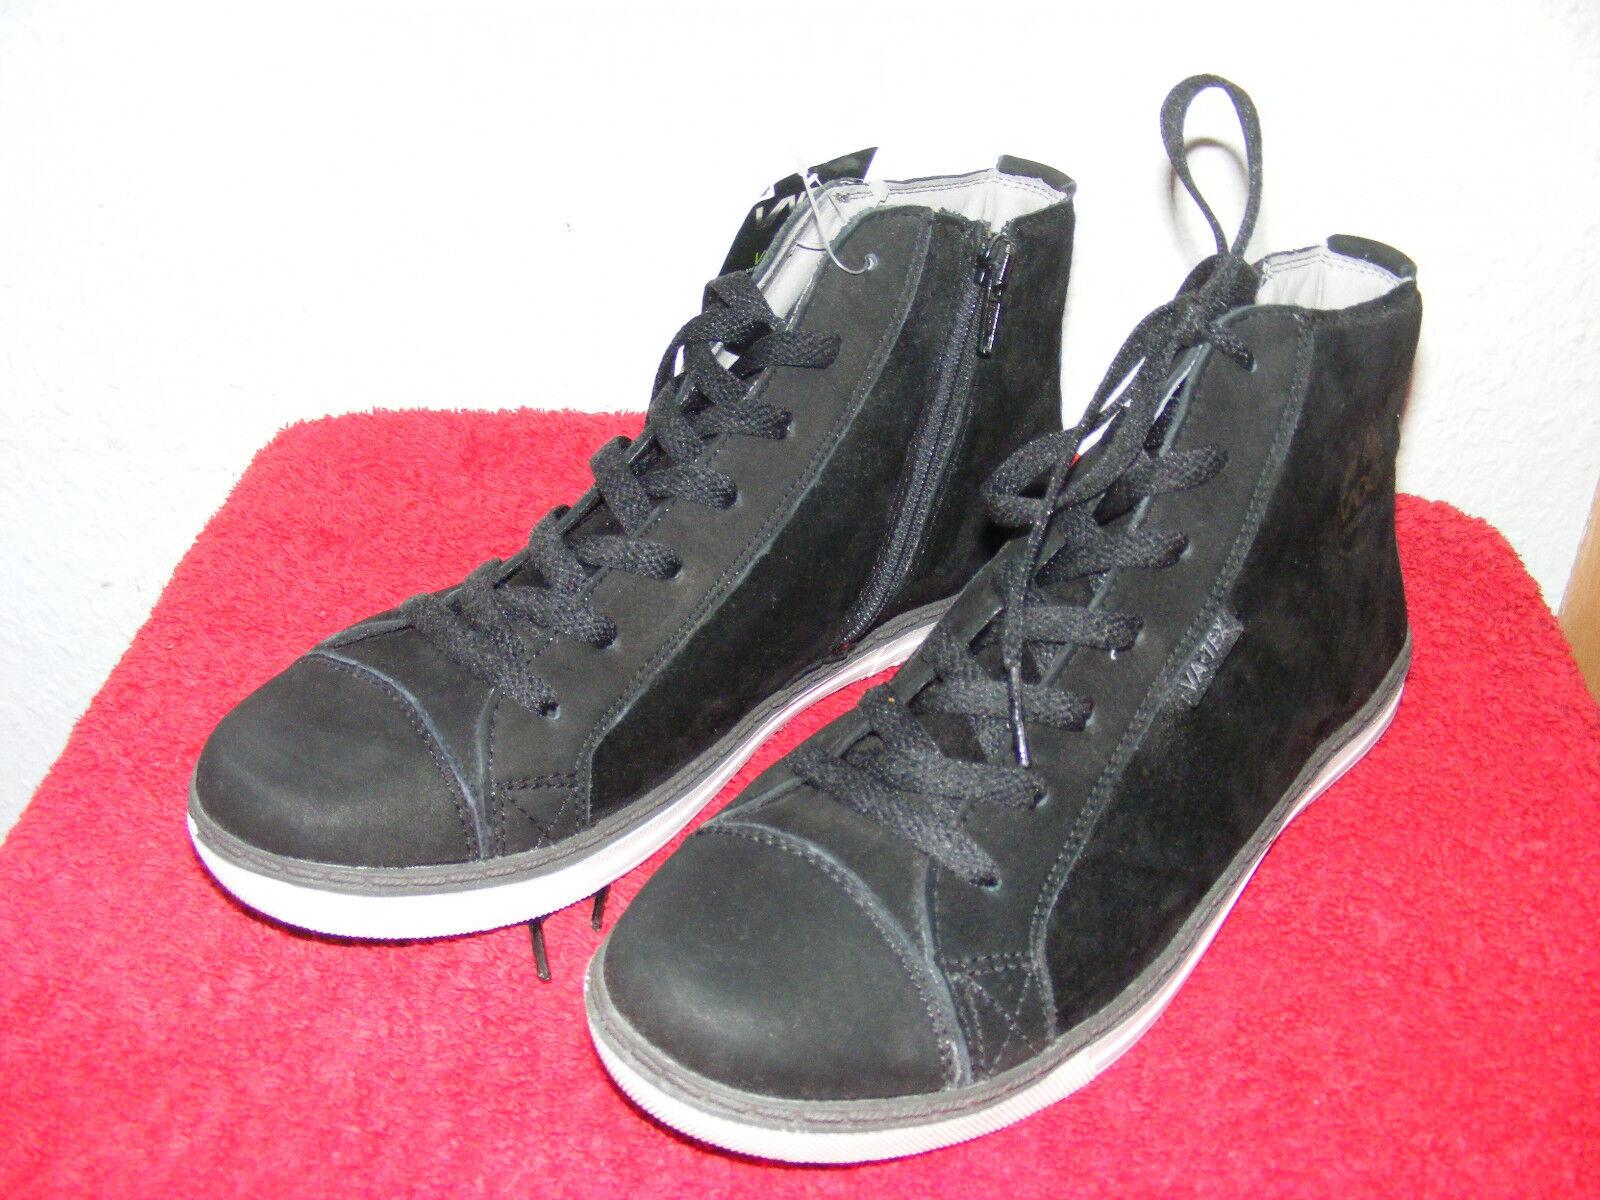 TG. 38 Neri Stivali Stivaletti da donna nero nuovo caviglia alta vado ORGINAL